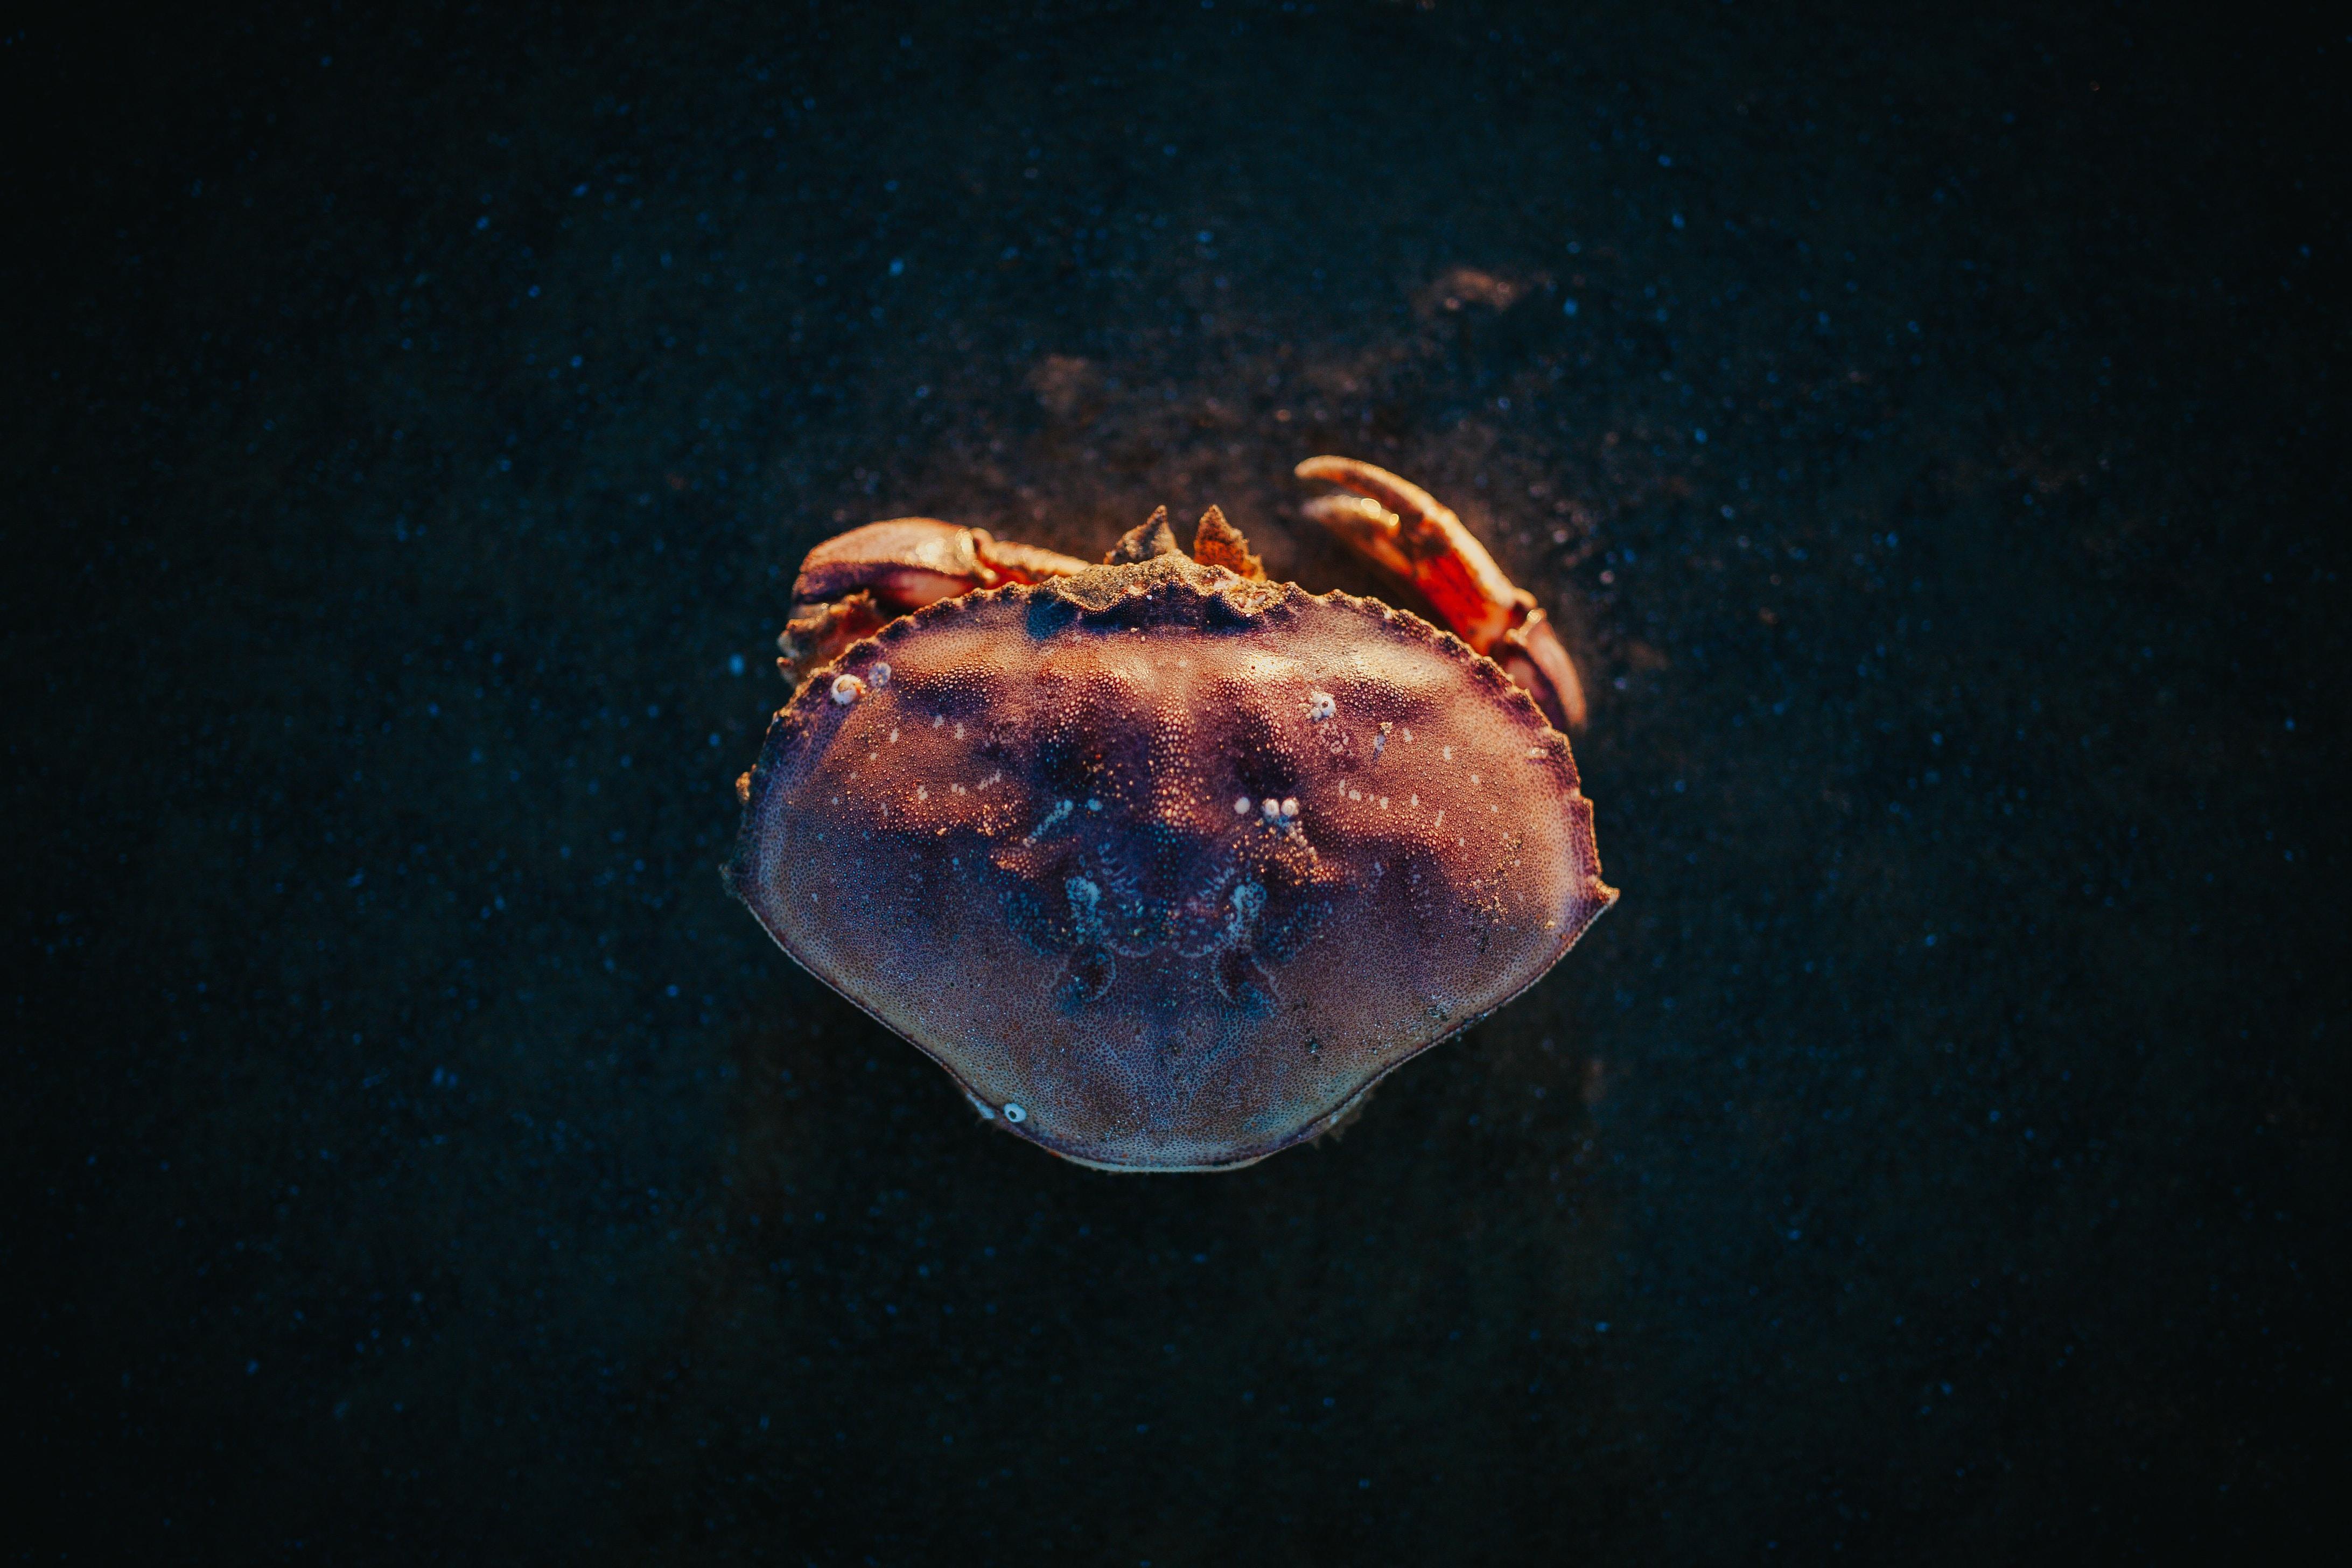 close-up photo ofg red crab